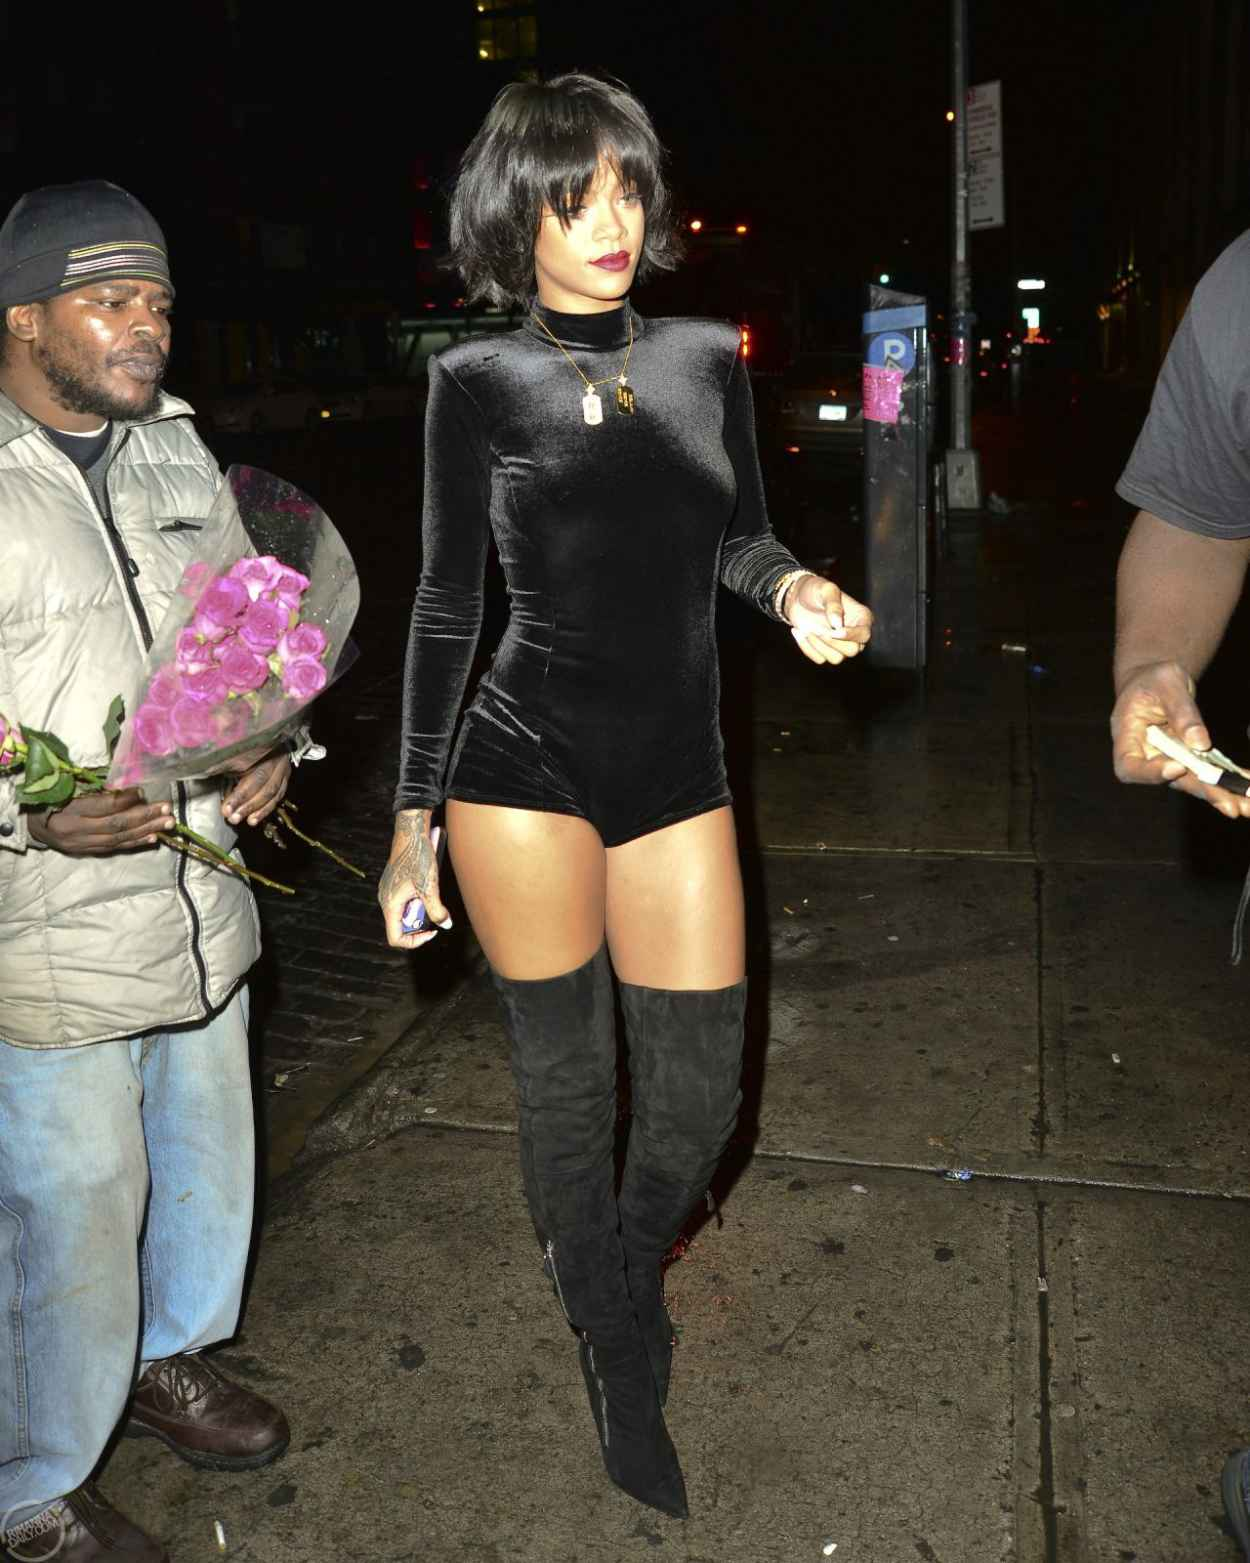 Rihanna Street Style - Wearing a short Jumpsuit in New York City - November 2015-4